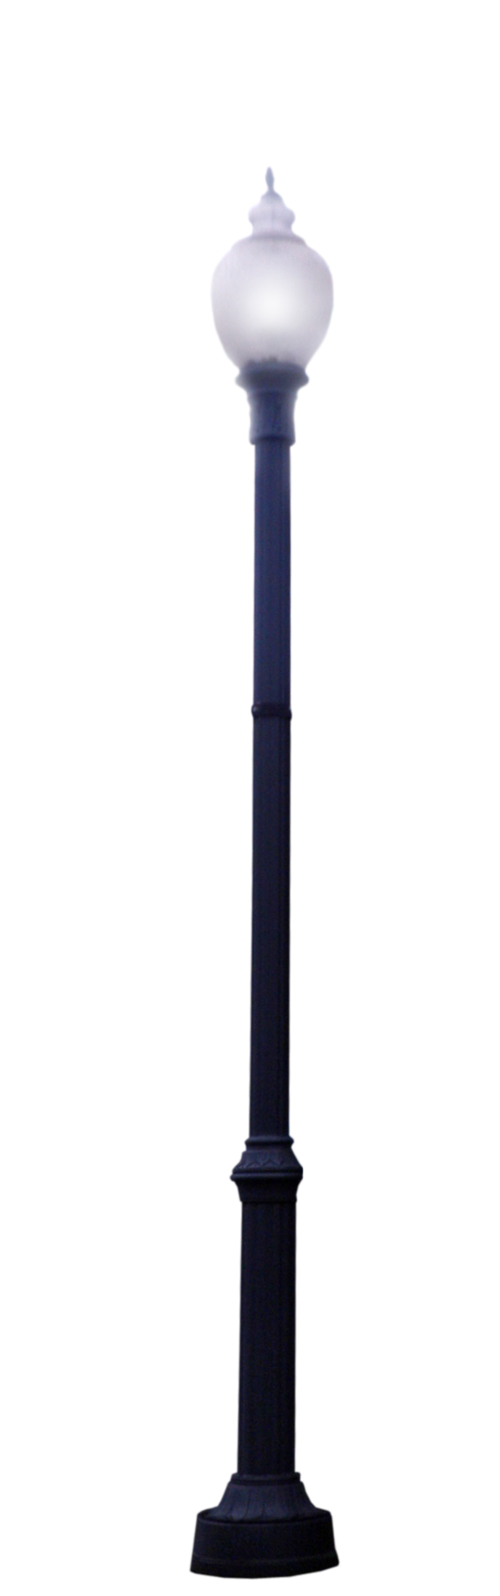 Streetlight PNG HD - 125556